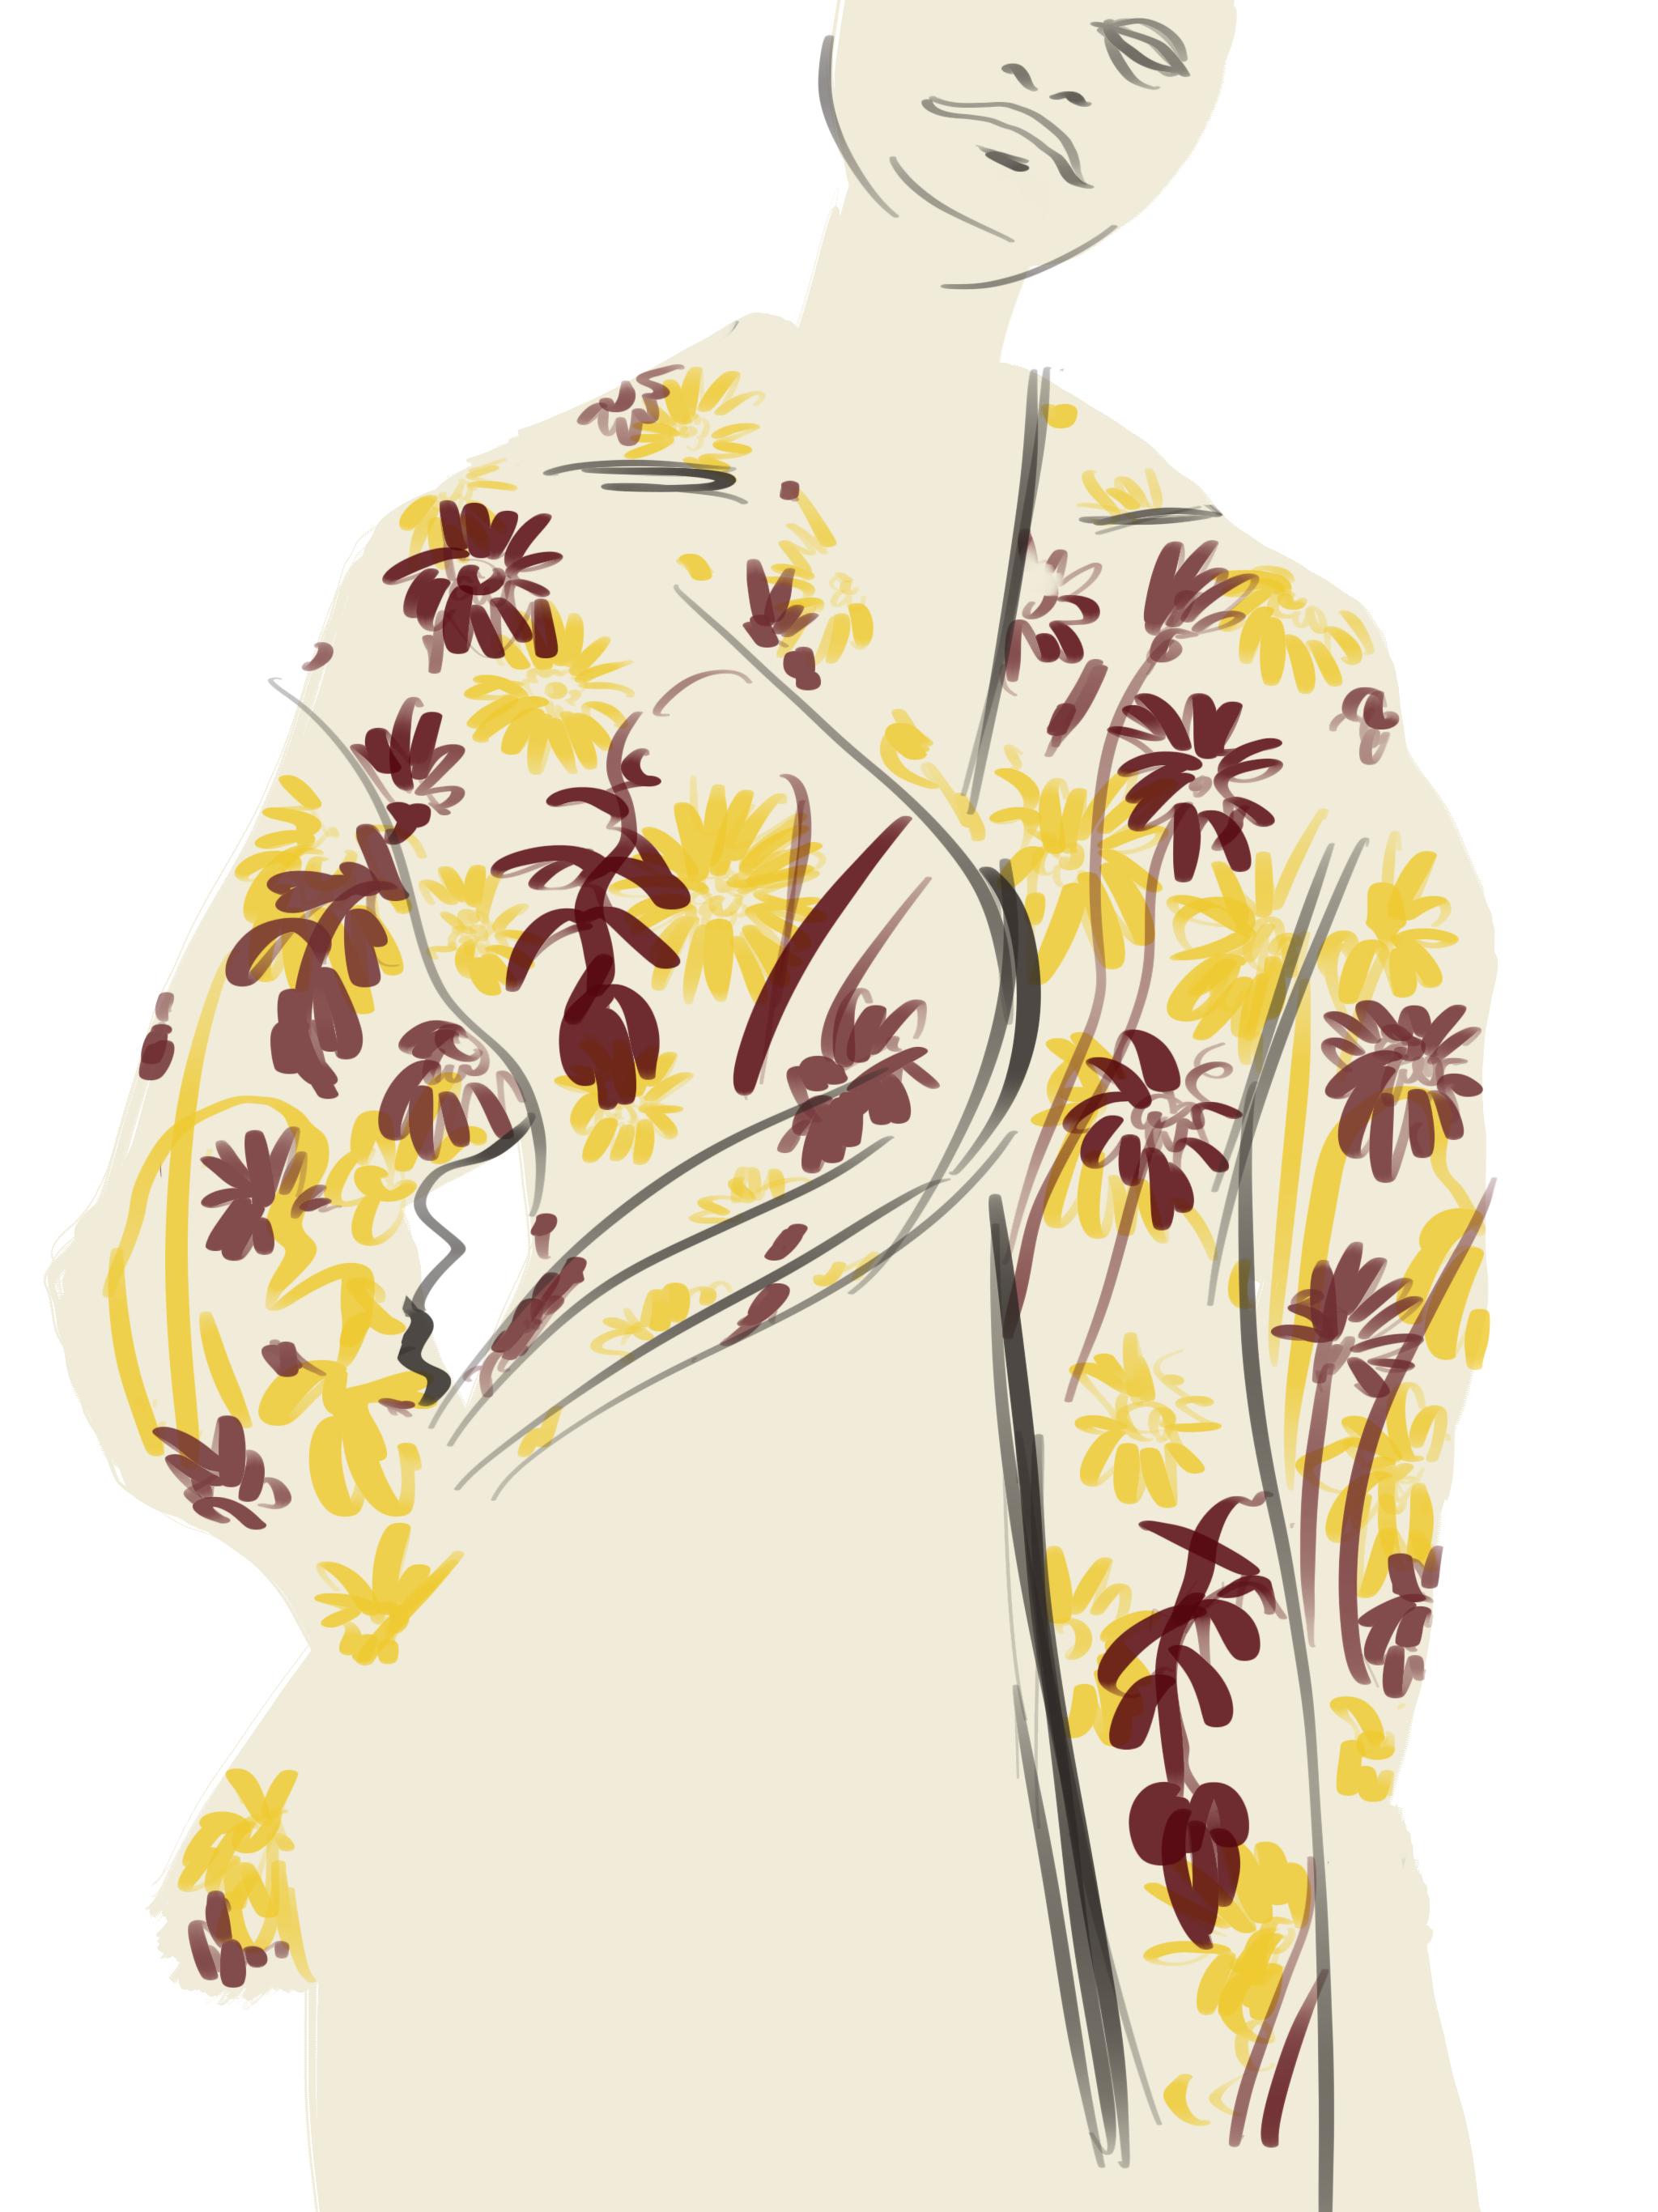 Hawaian Shirt illustration by Silvana Mariani